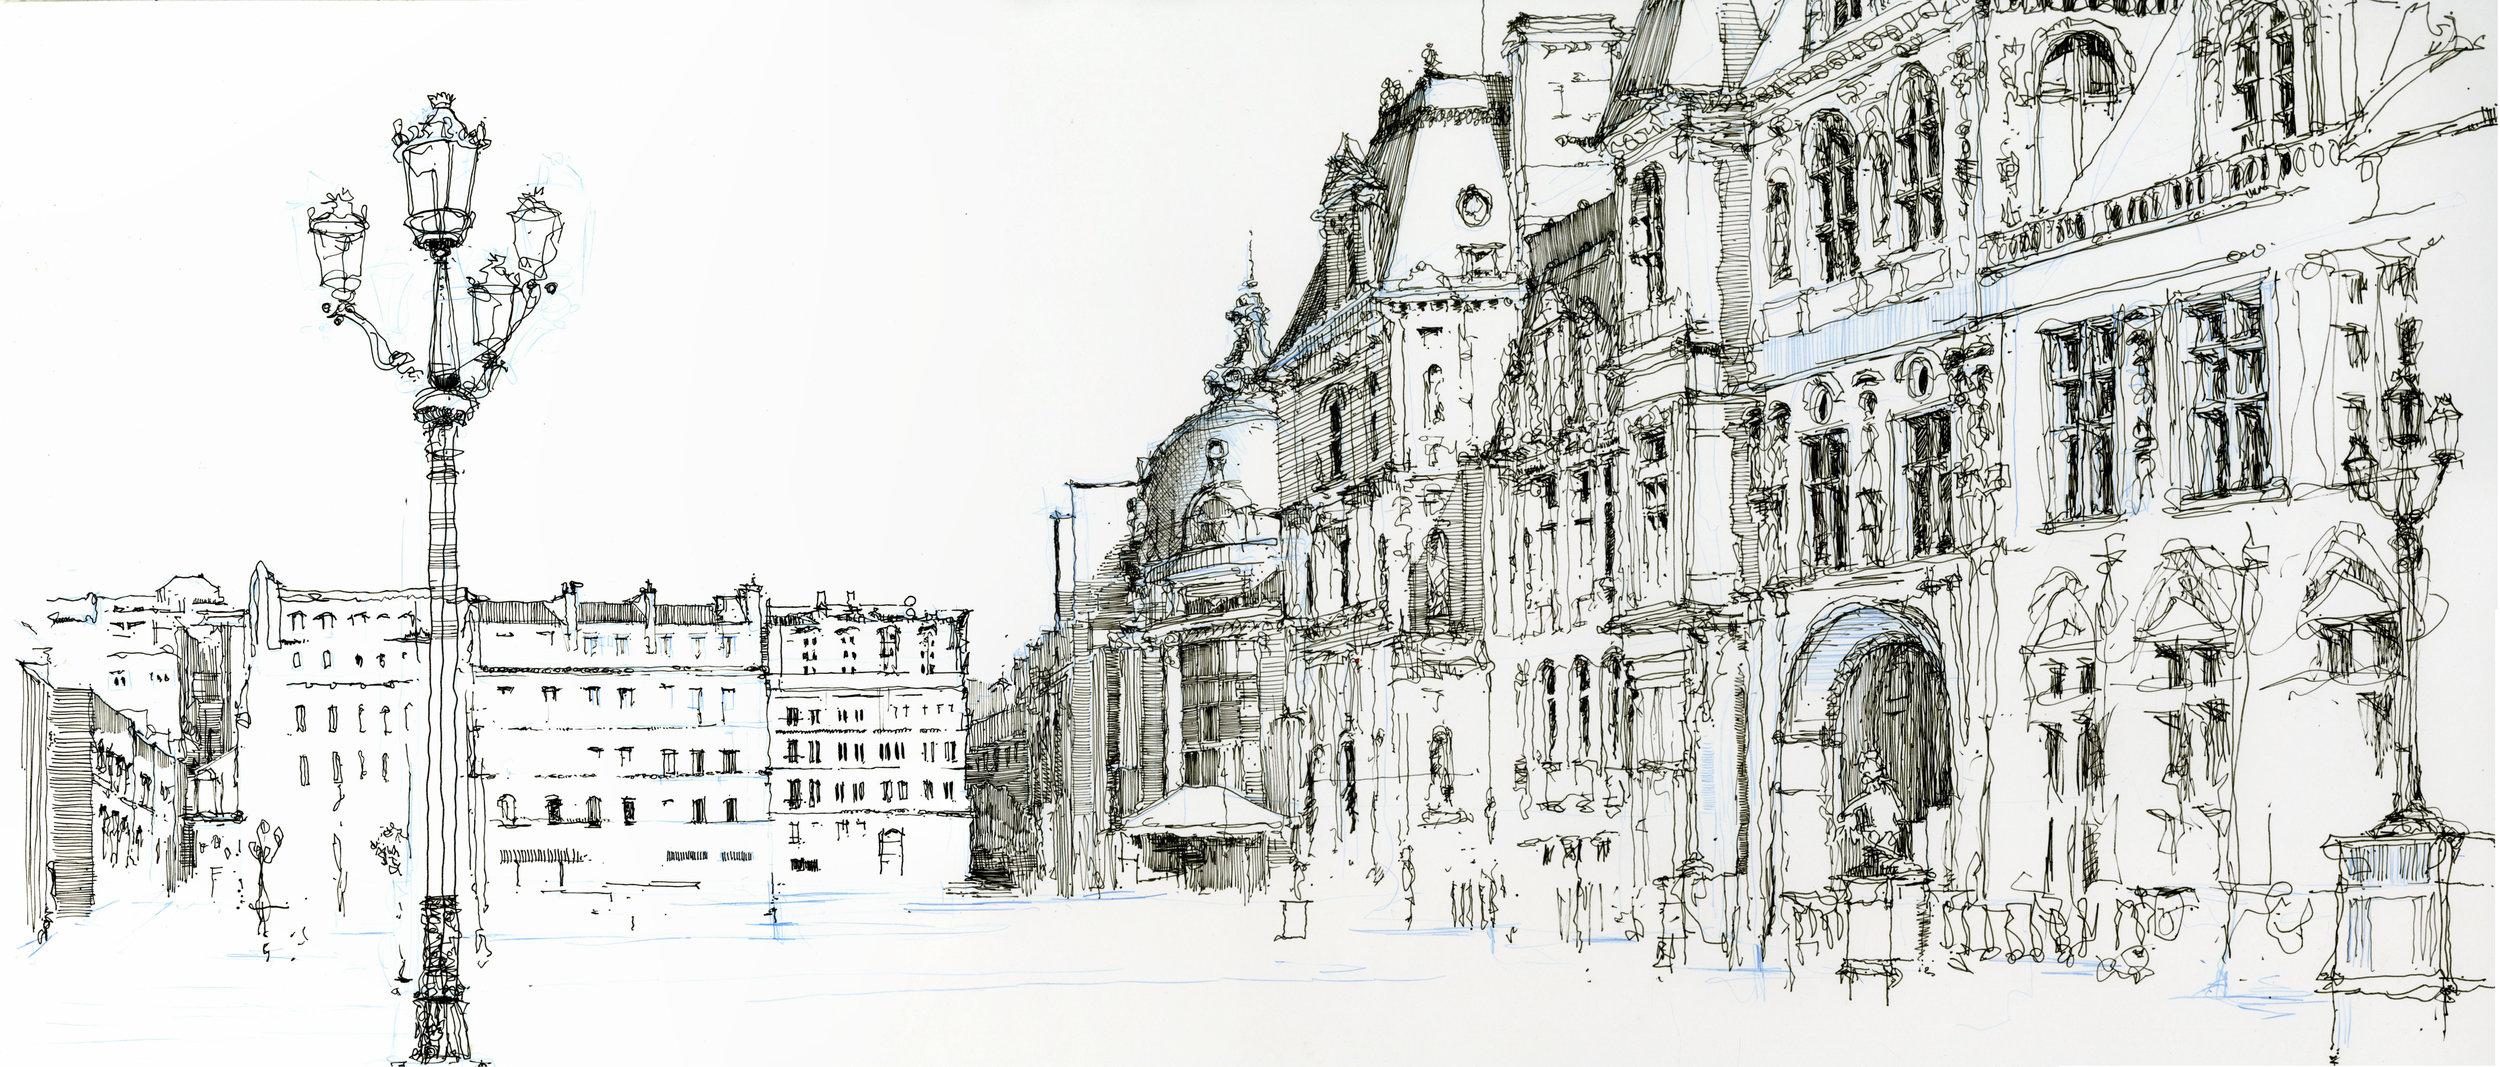 "Hotel de Ville, 2016, ink on paper, 12"" x 26"""